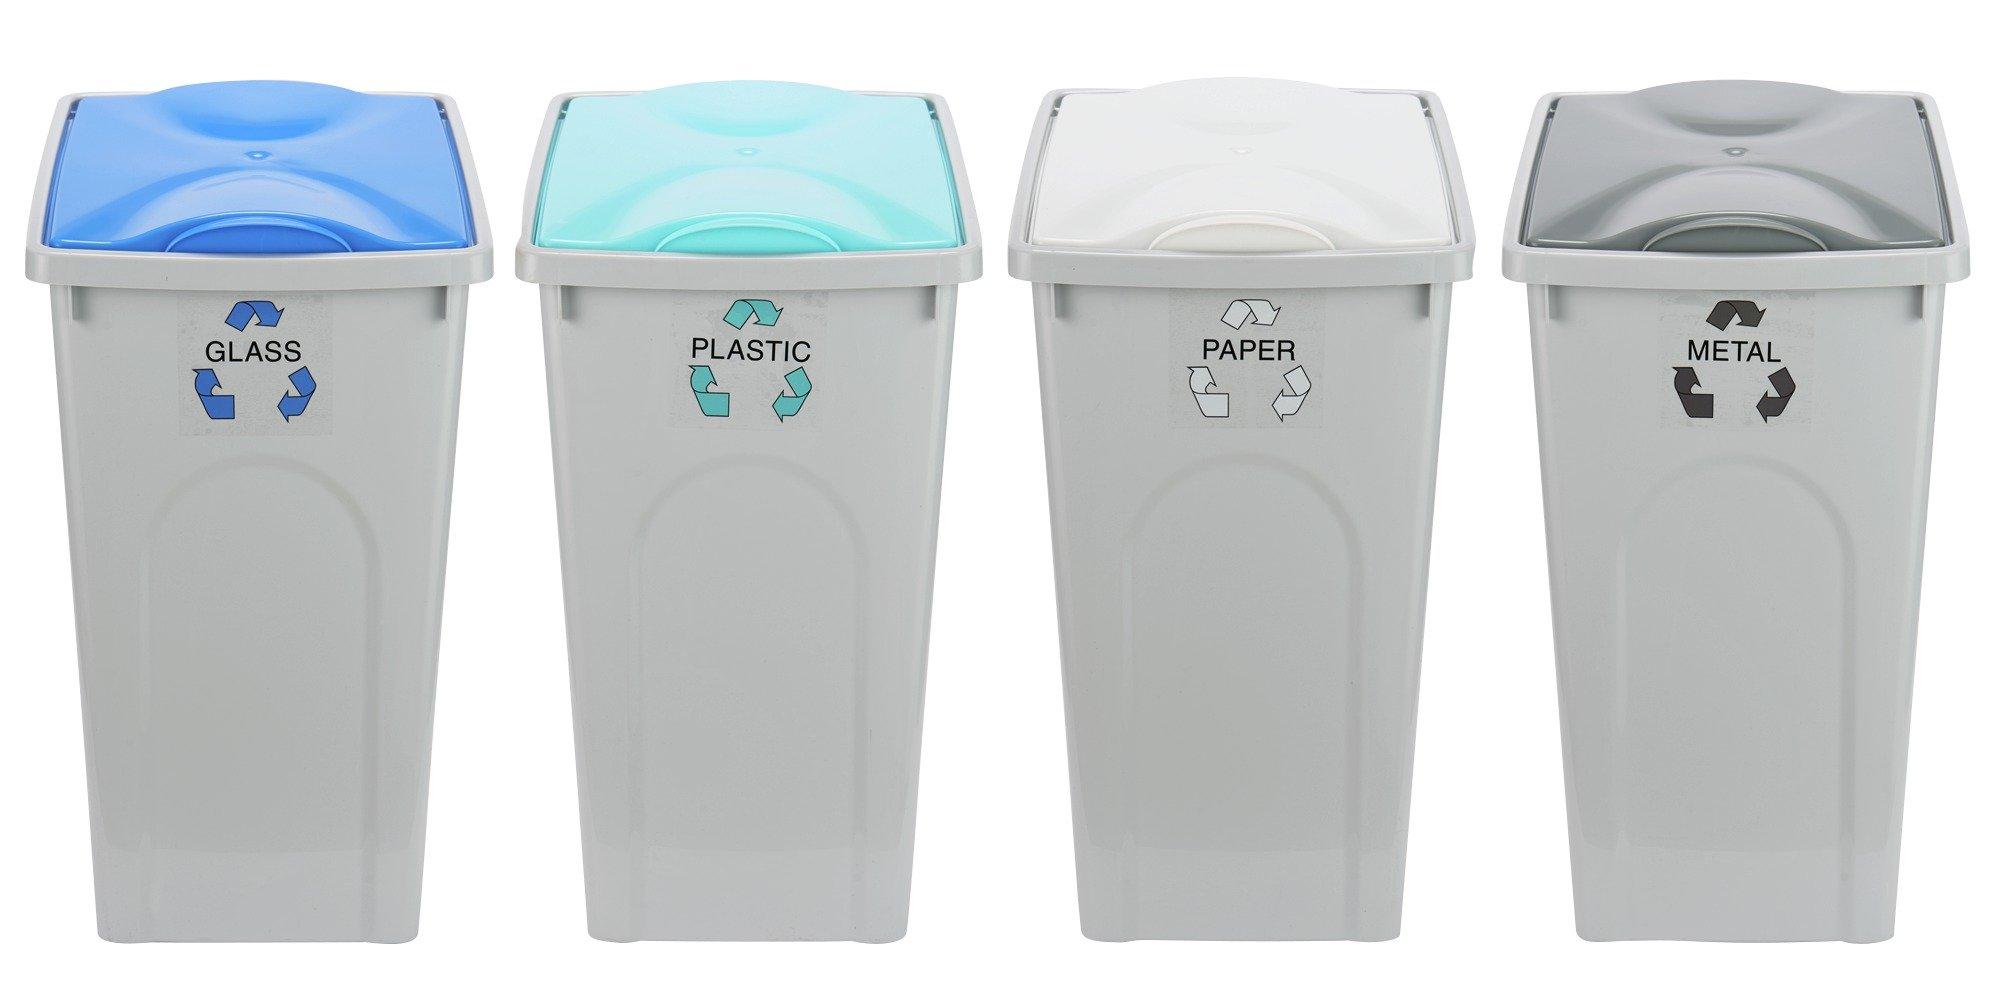 Argos Home 50 Litre Recycling Bins - Set of 4